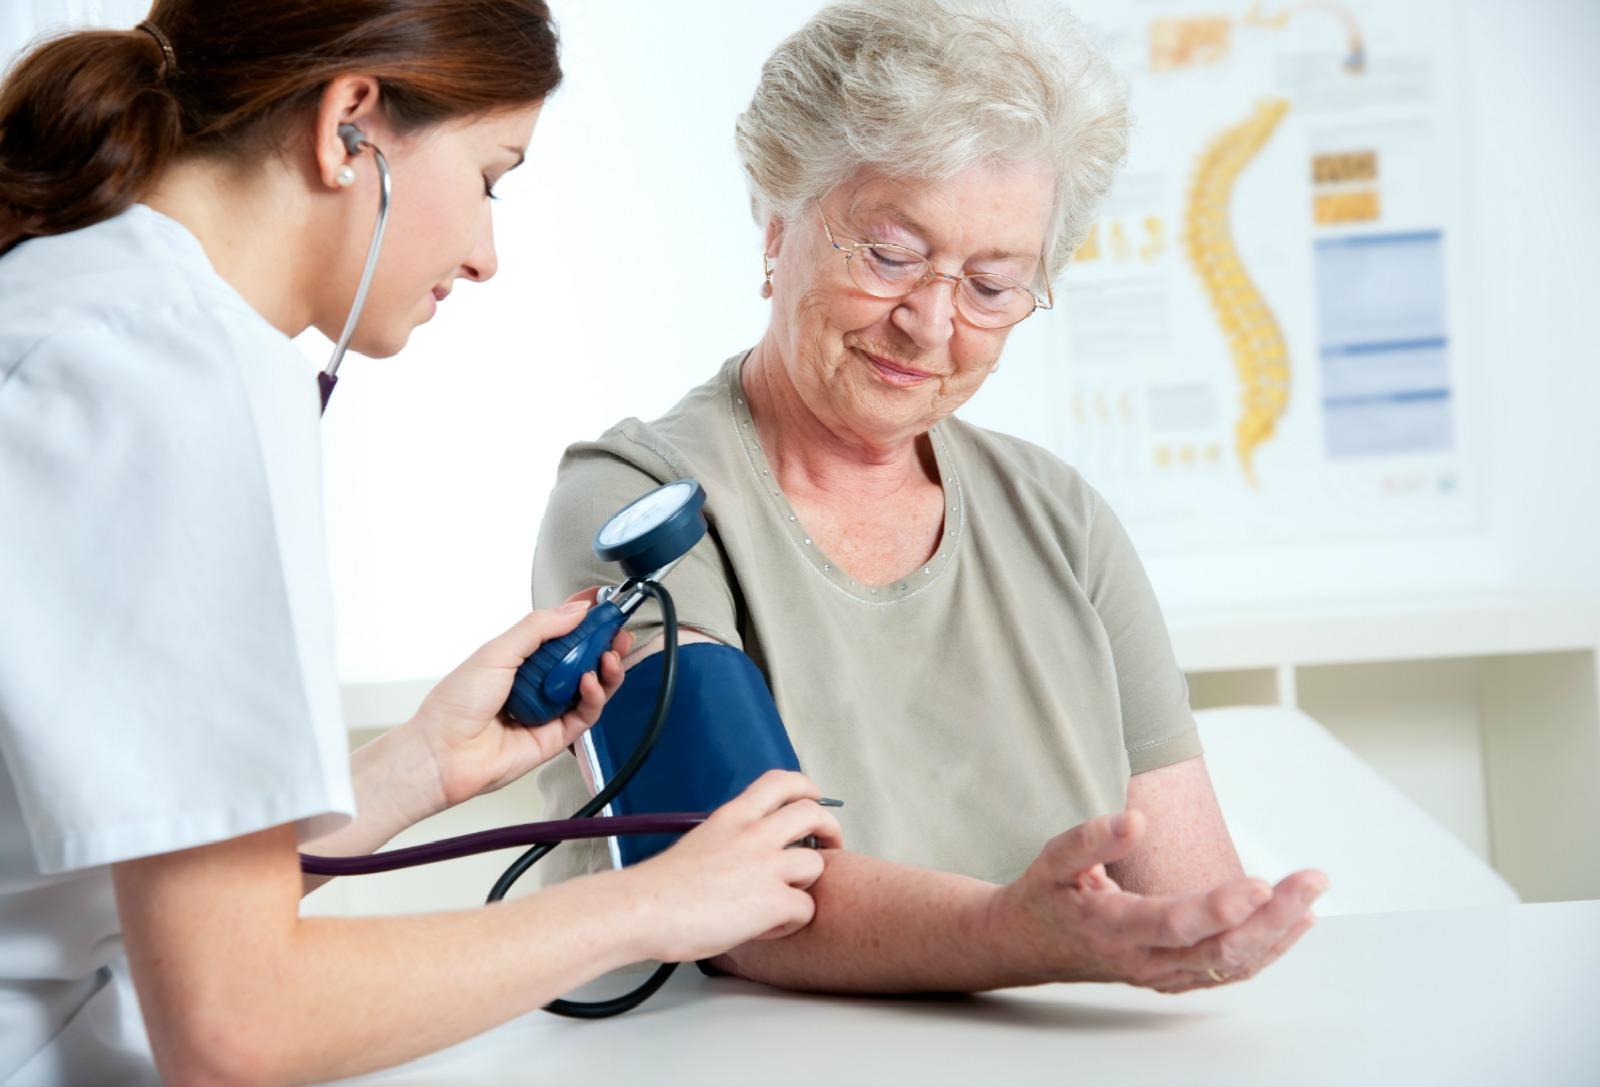 womens-health-screening-3.jpg